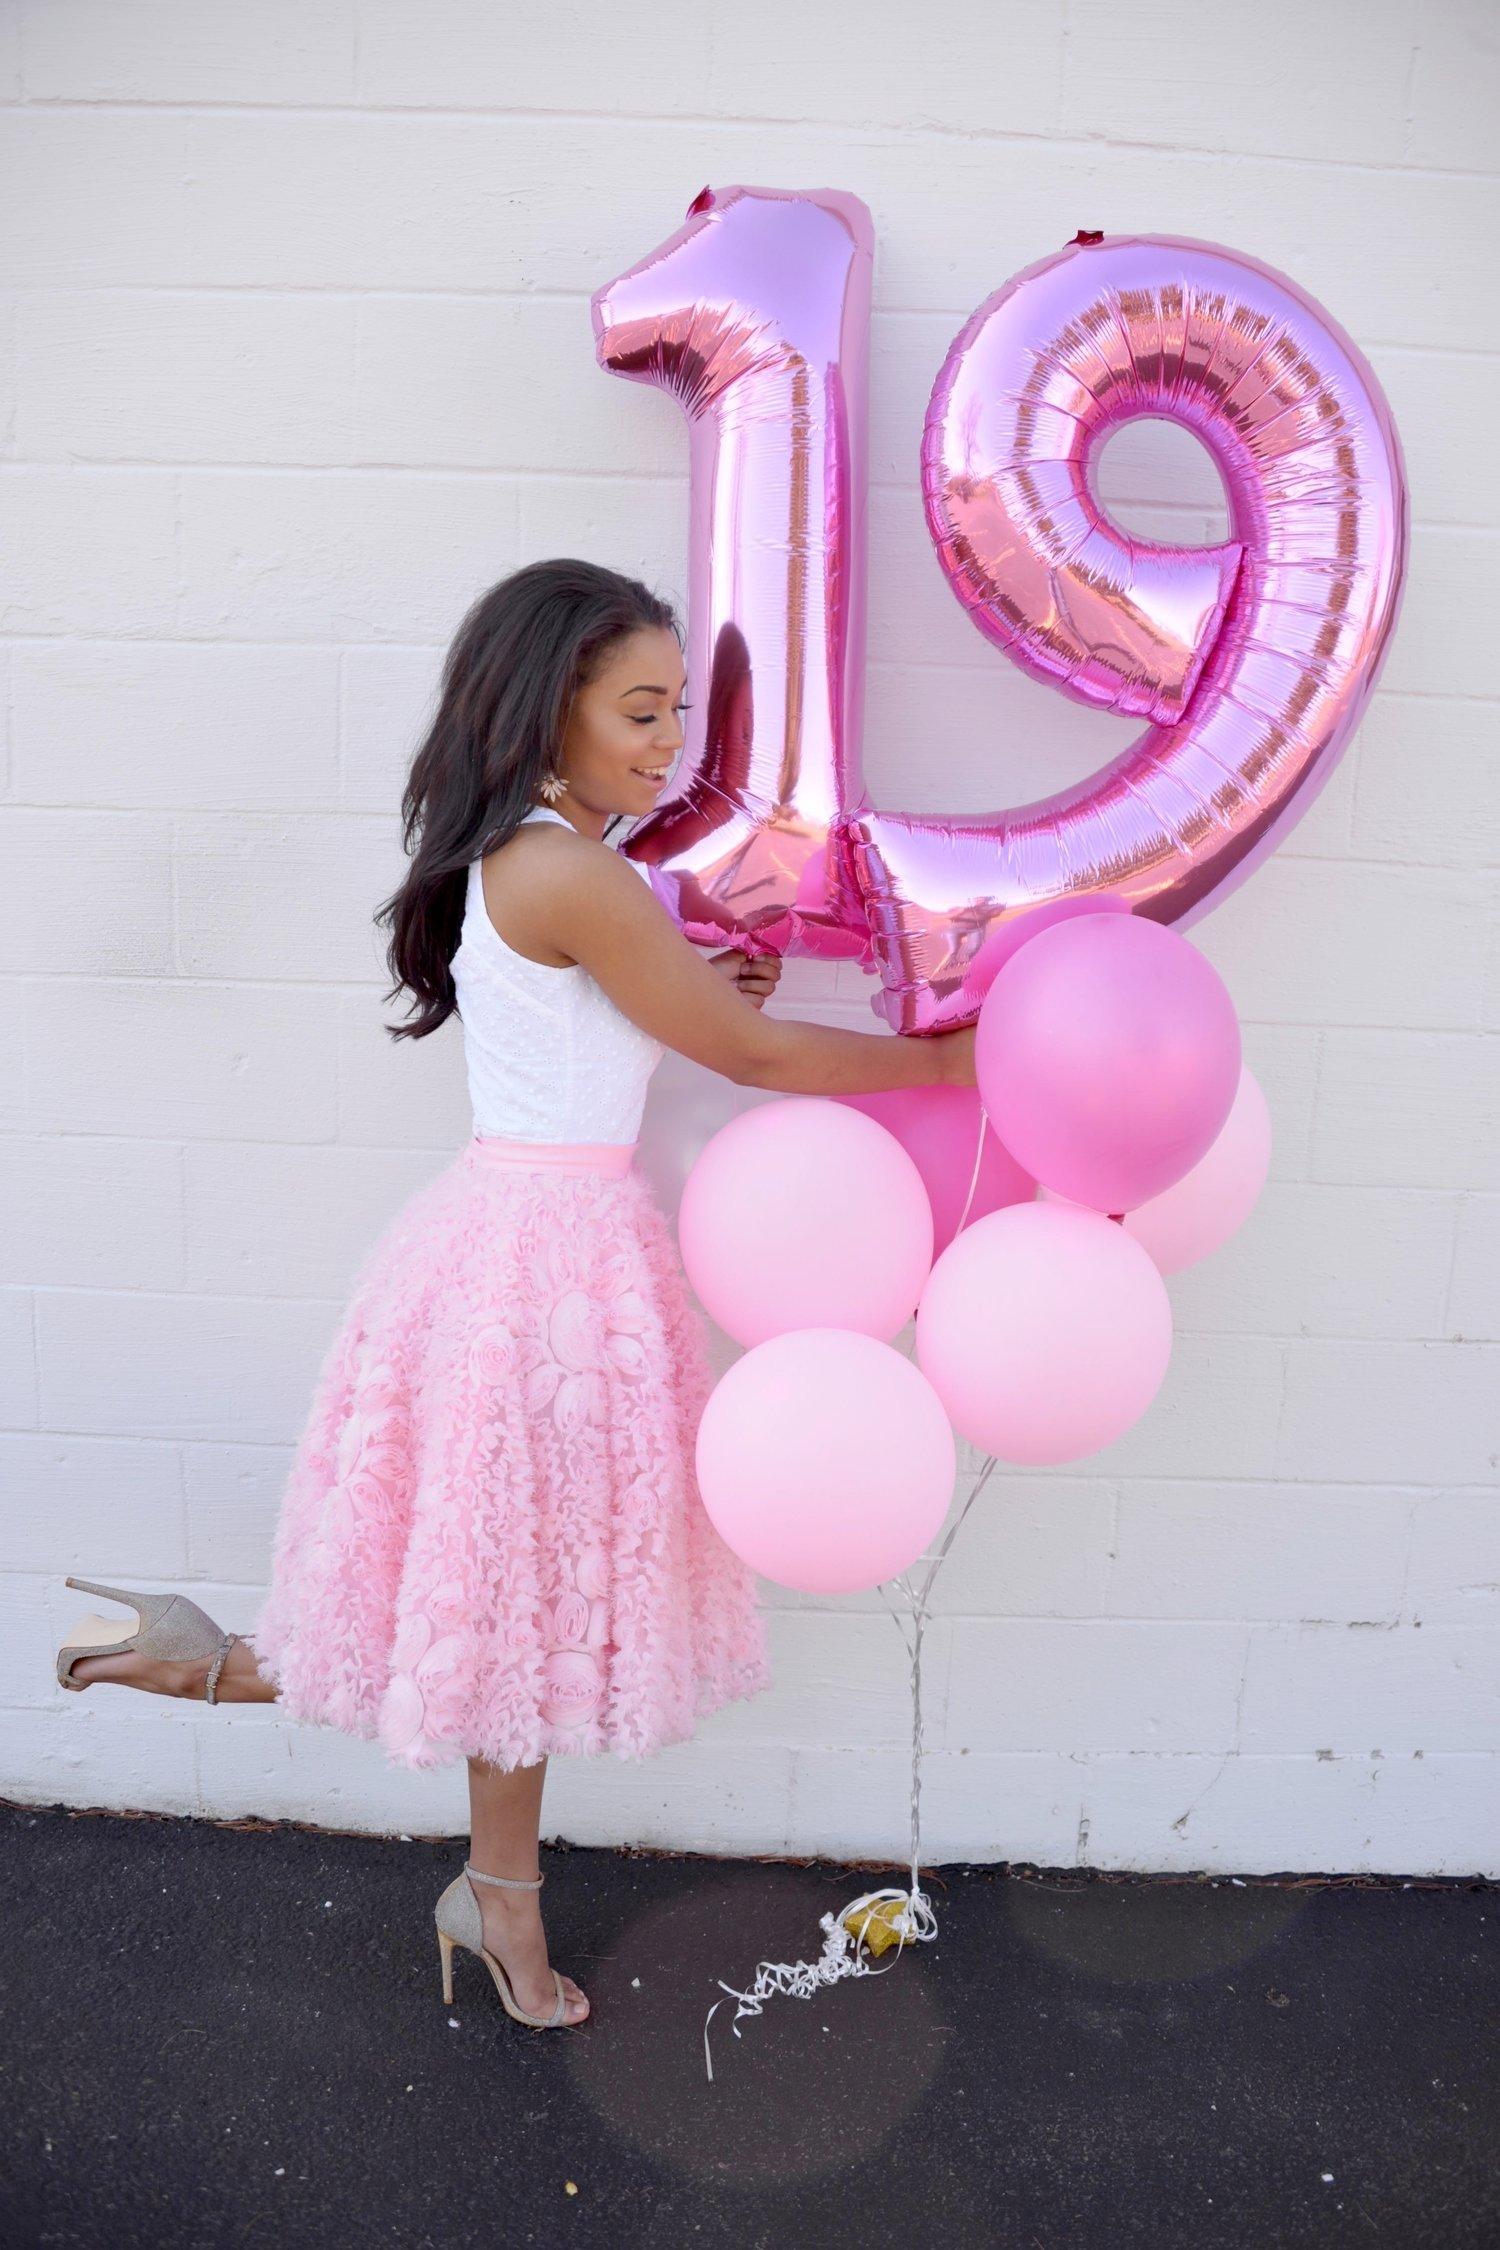 10 Stylish Photo Shoot Birthday Party Ideas pinaya sellami on birthday pinterest birthdays sweet 16 and